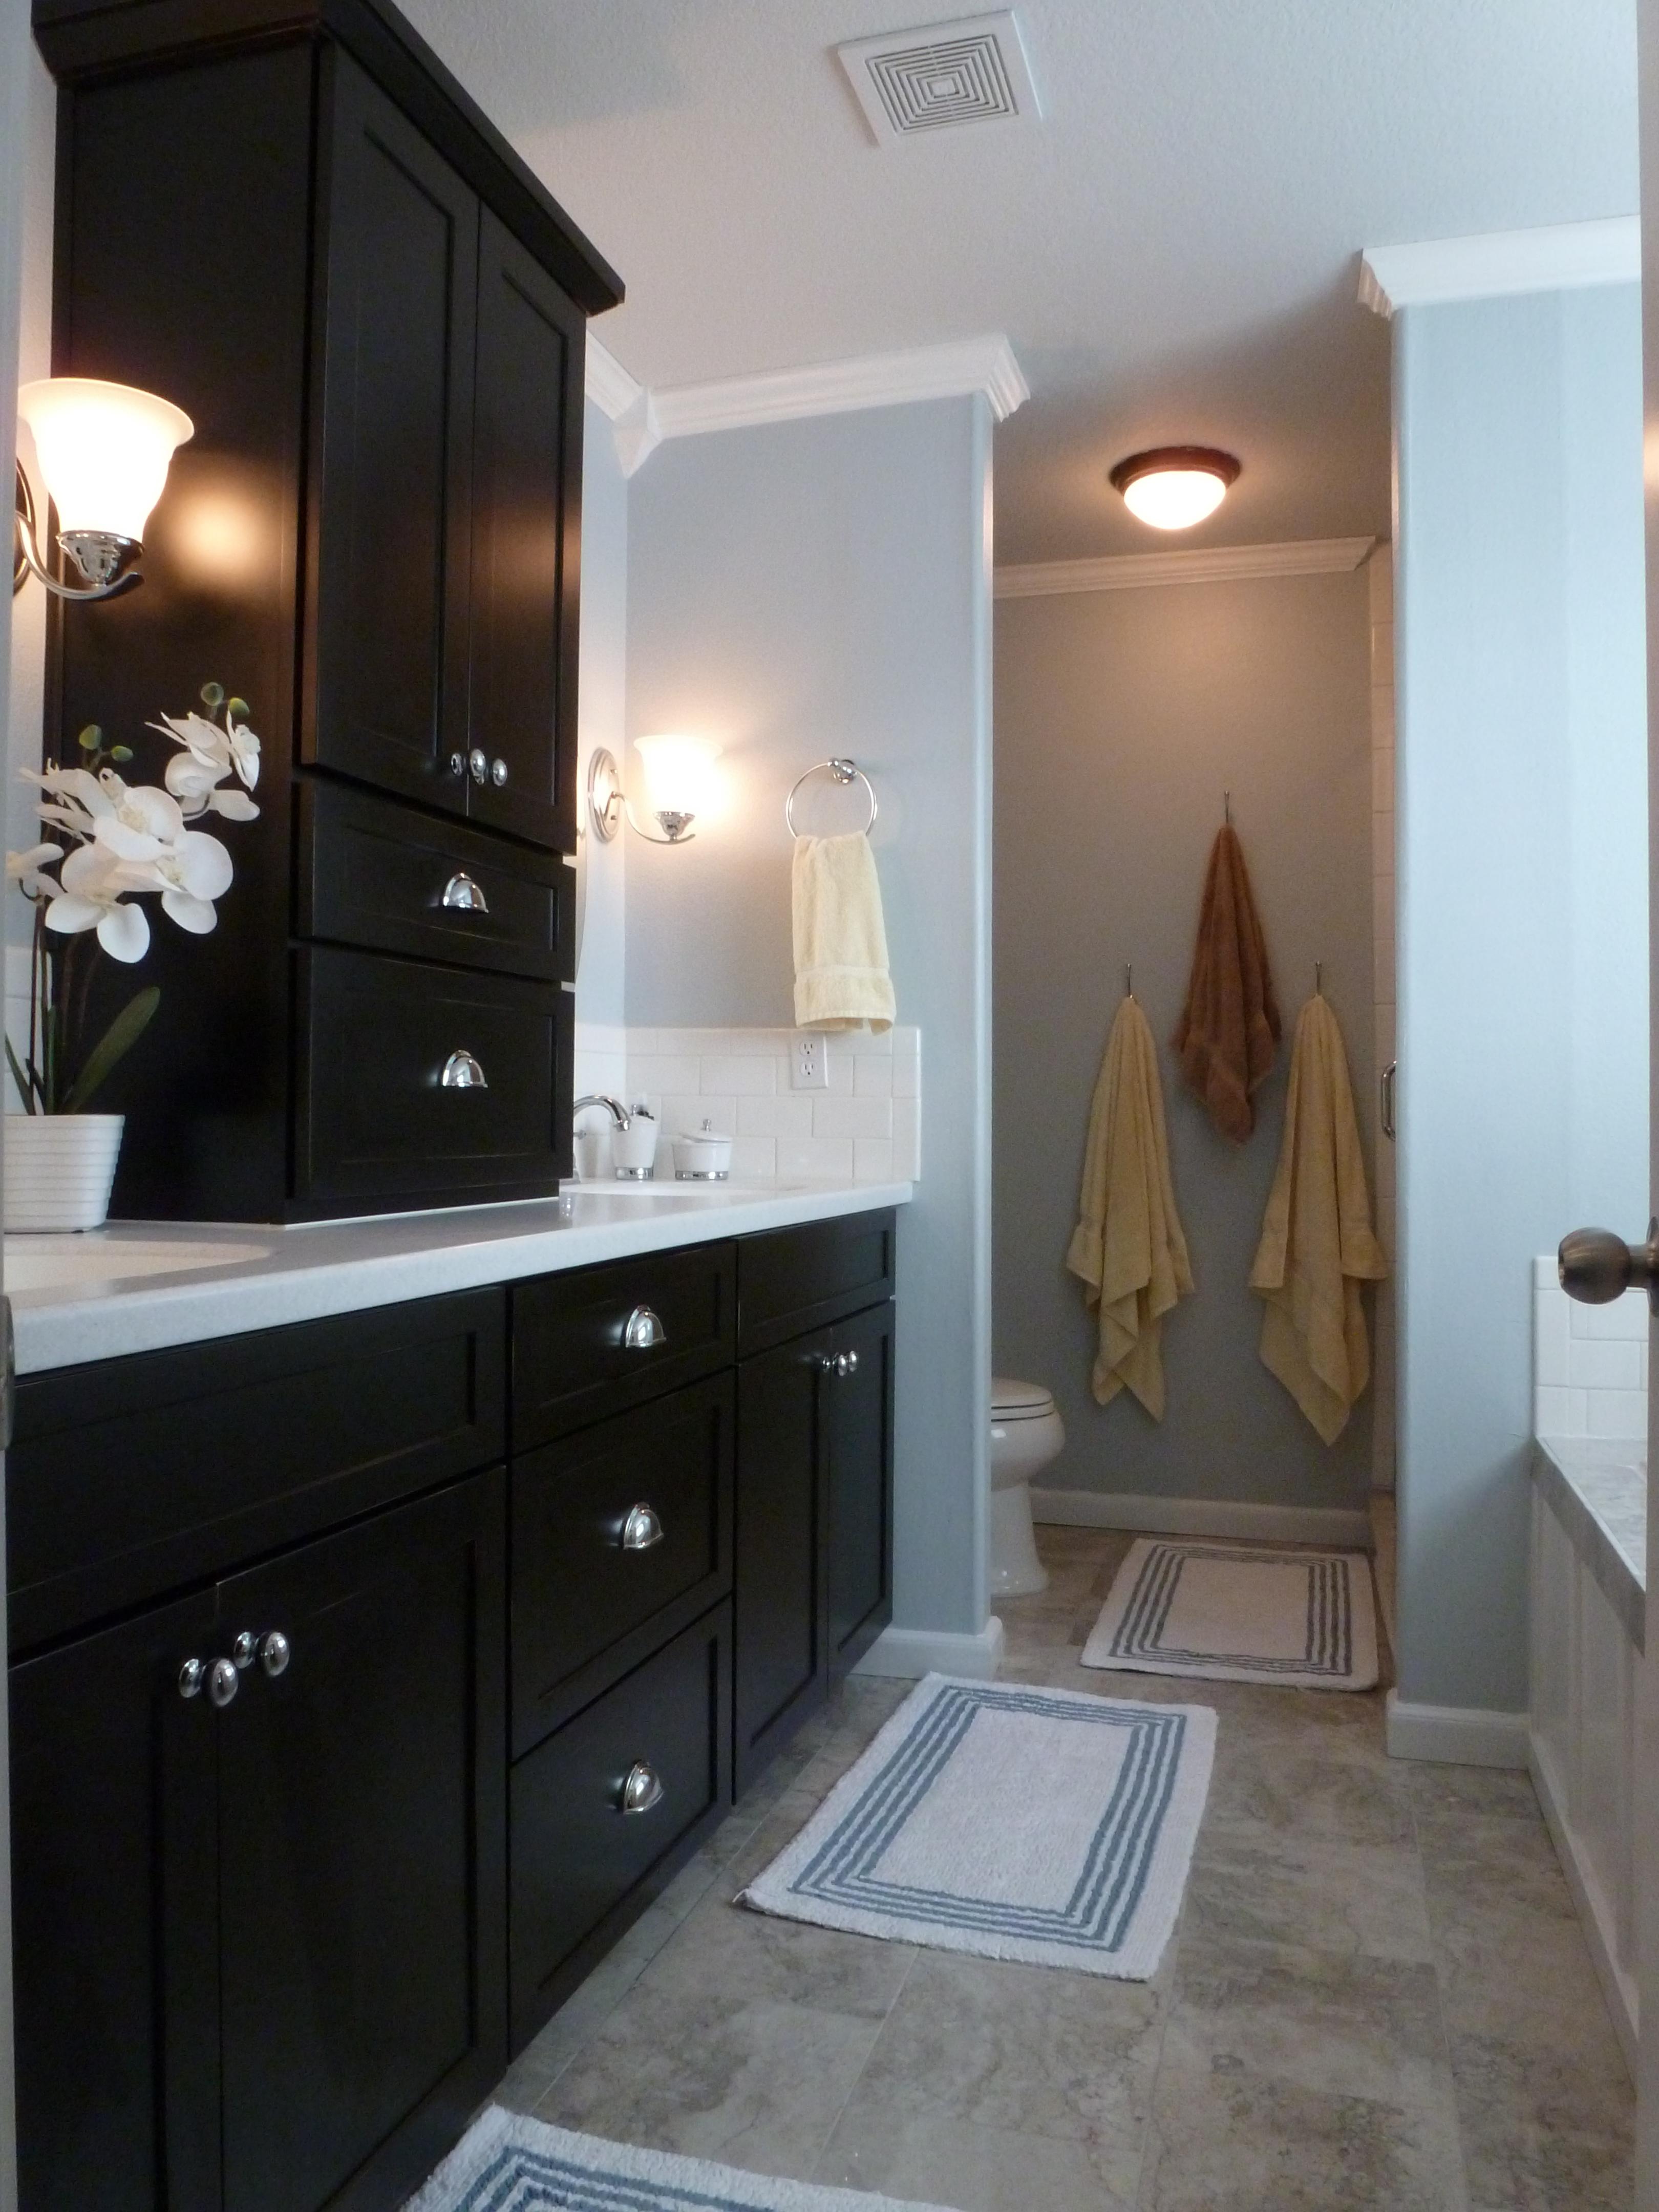 Delighful Bathroom Remodel Blue Tub M Throughout Design Inspiration